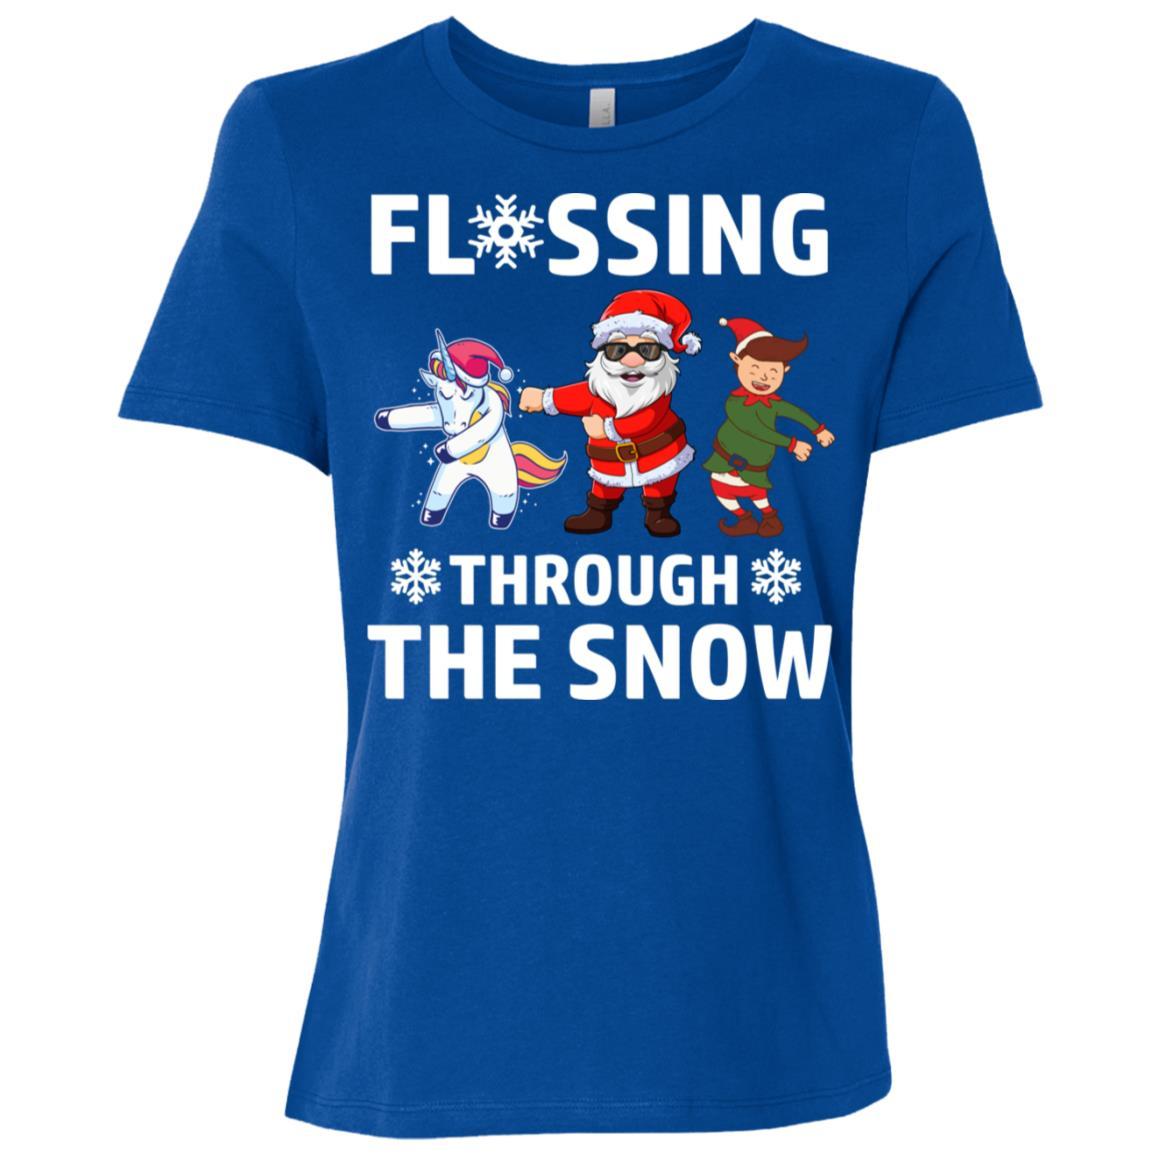 Flossing Through The Snow Santa Dance Women Short Sleeve T-Shirt